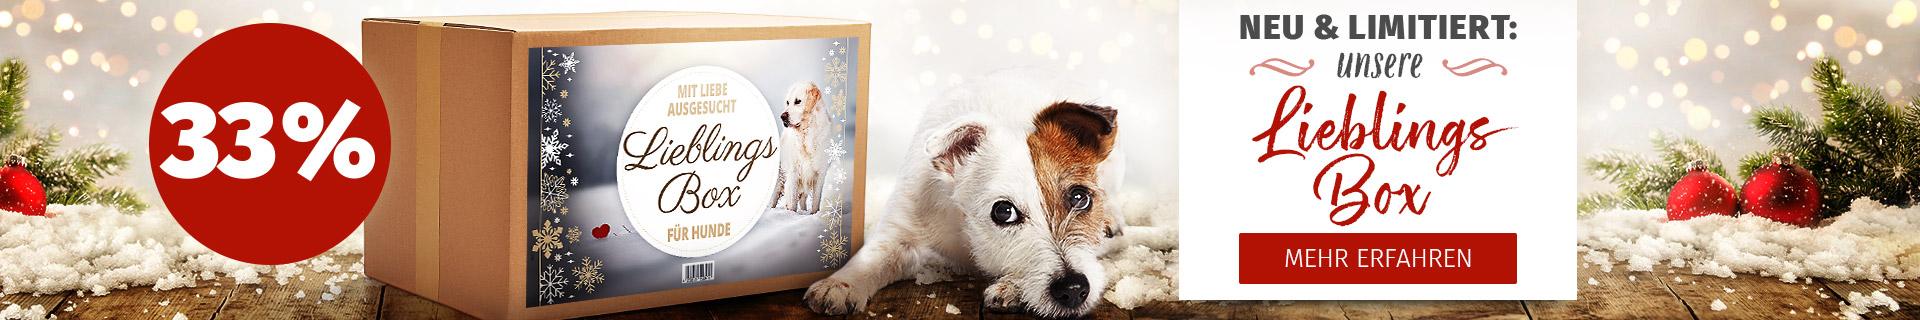 Lieblings Box für Hunde